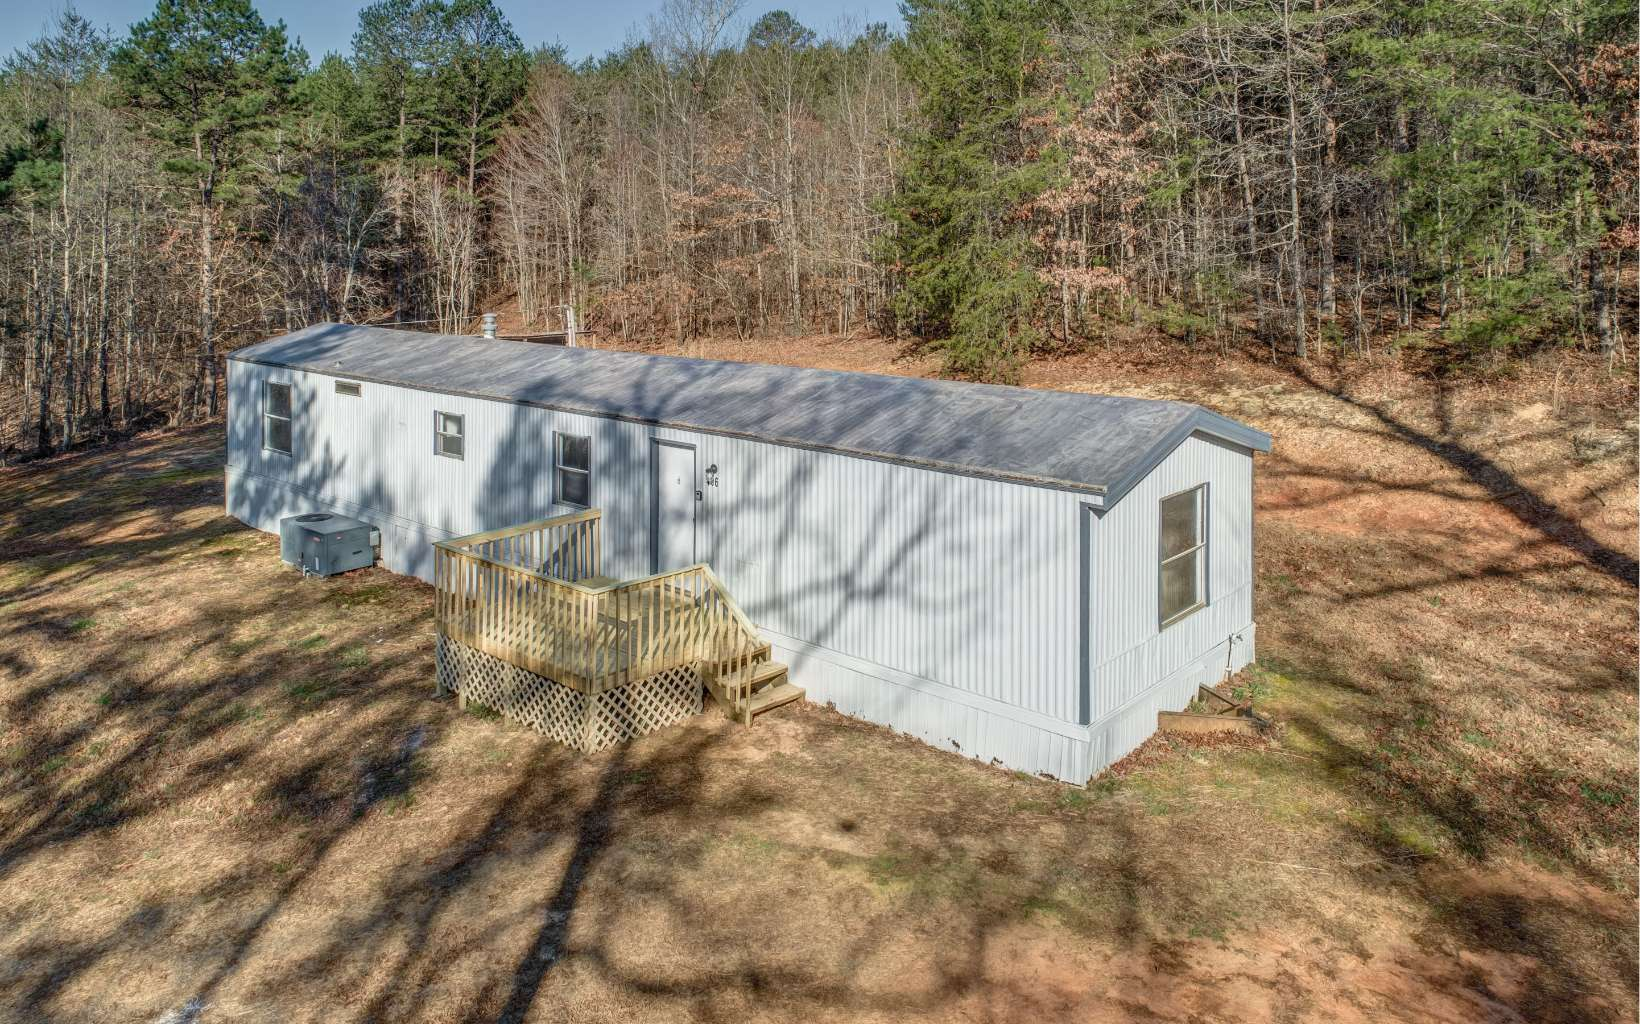 456 Joy Drive, McCaysville, GA | MLS# 286952 | Cozy Cove